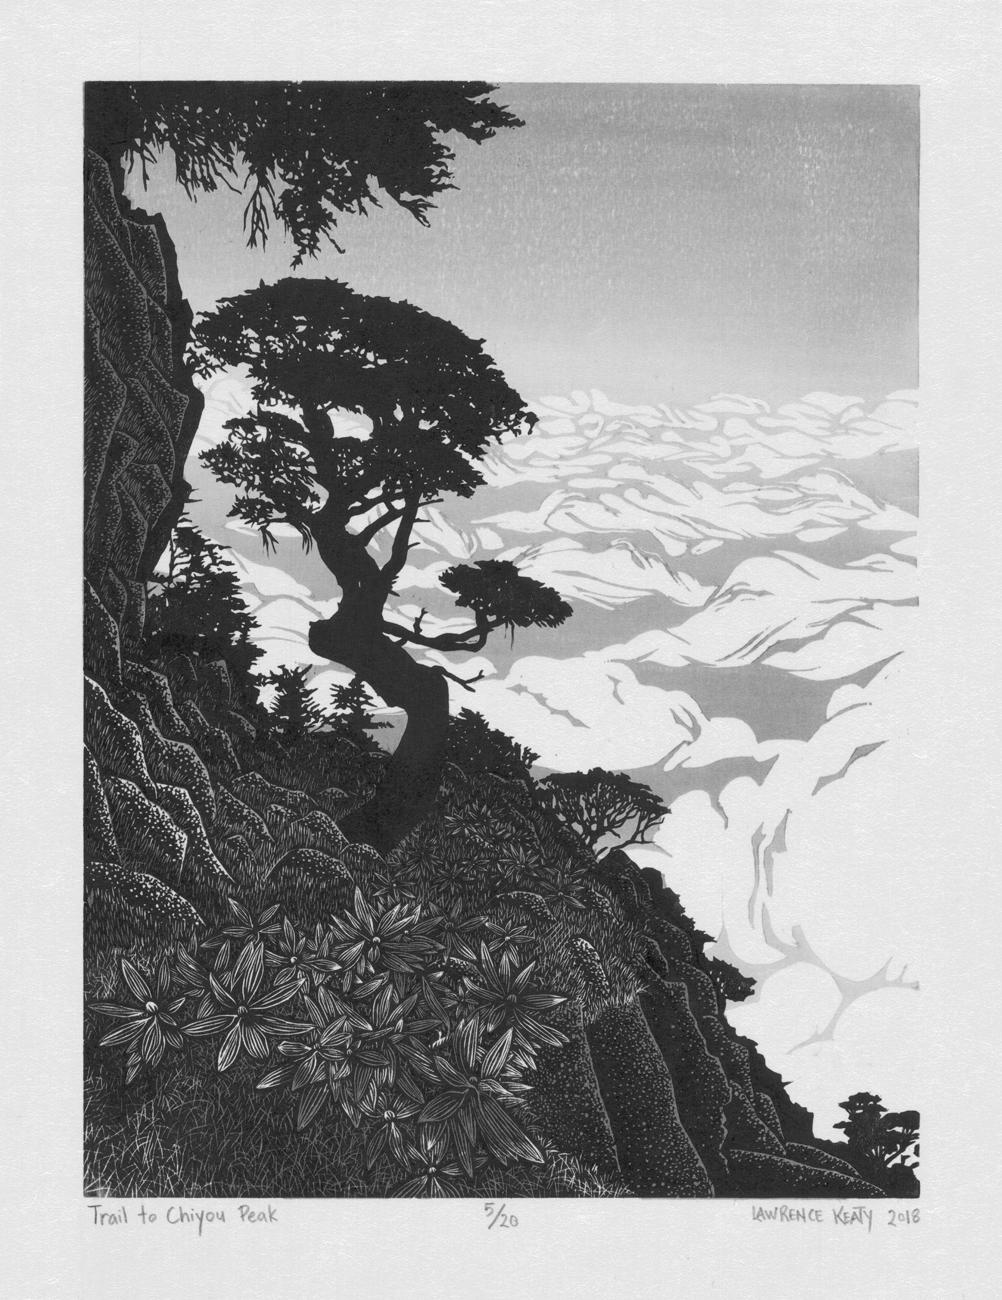 Trail to Chiyou Peak